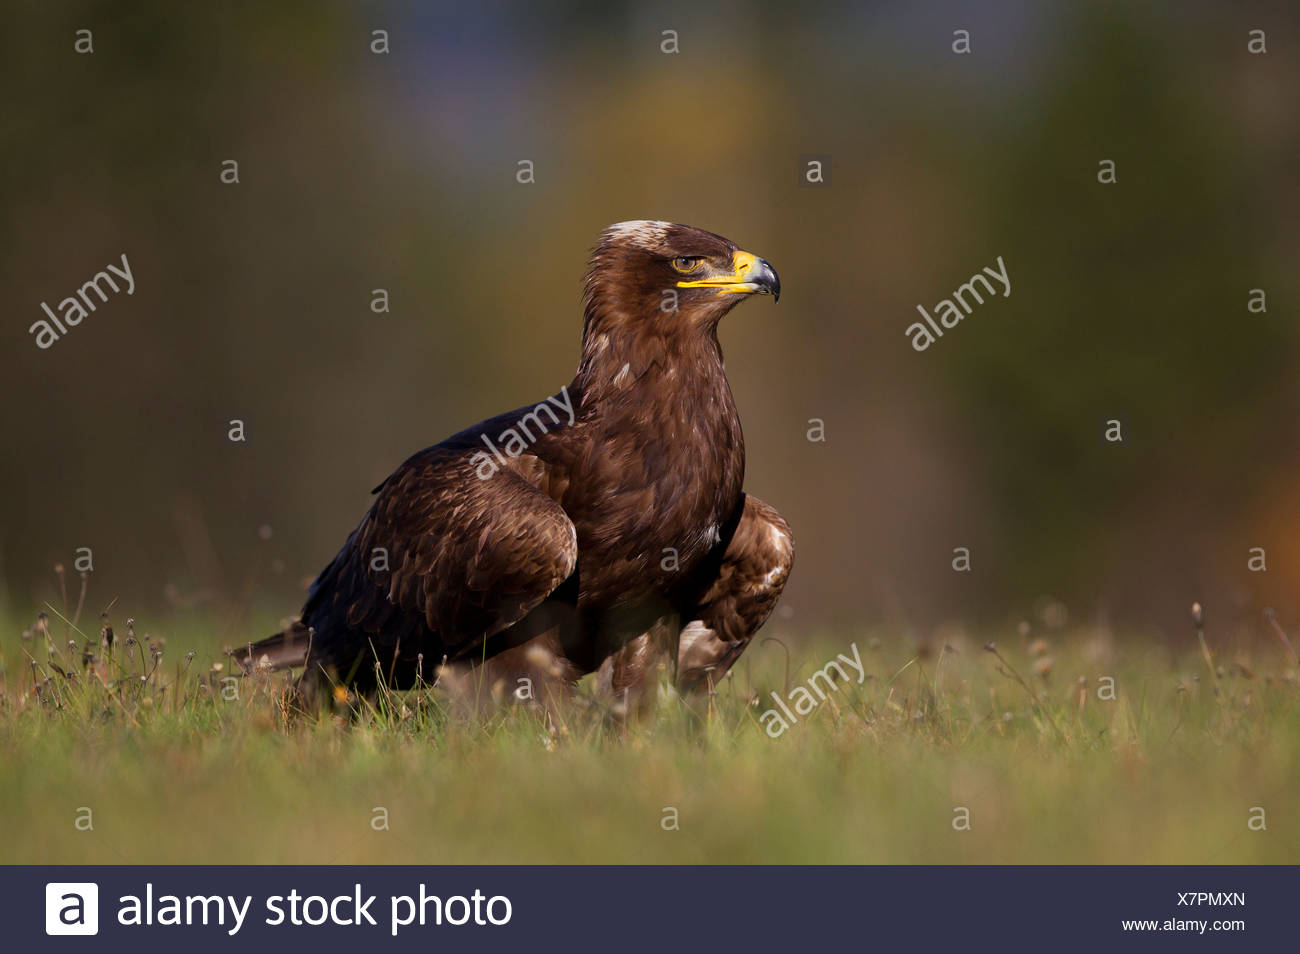 Steppe Eagle (Aquila nipalensis), falconry bird - Stock Image